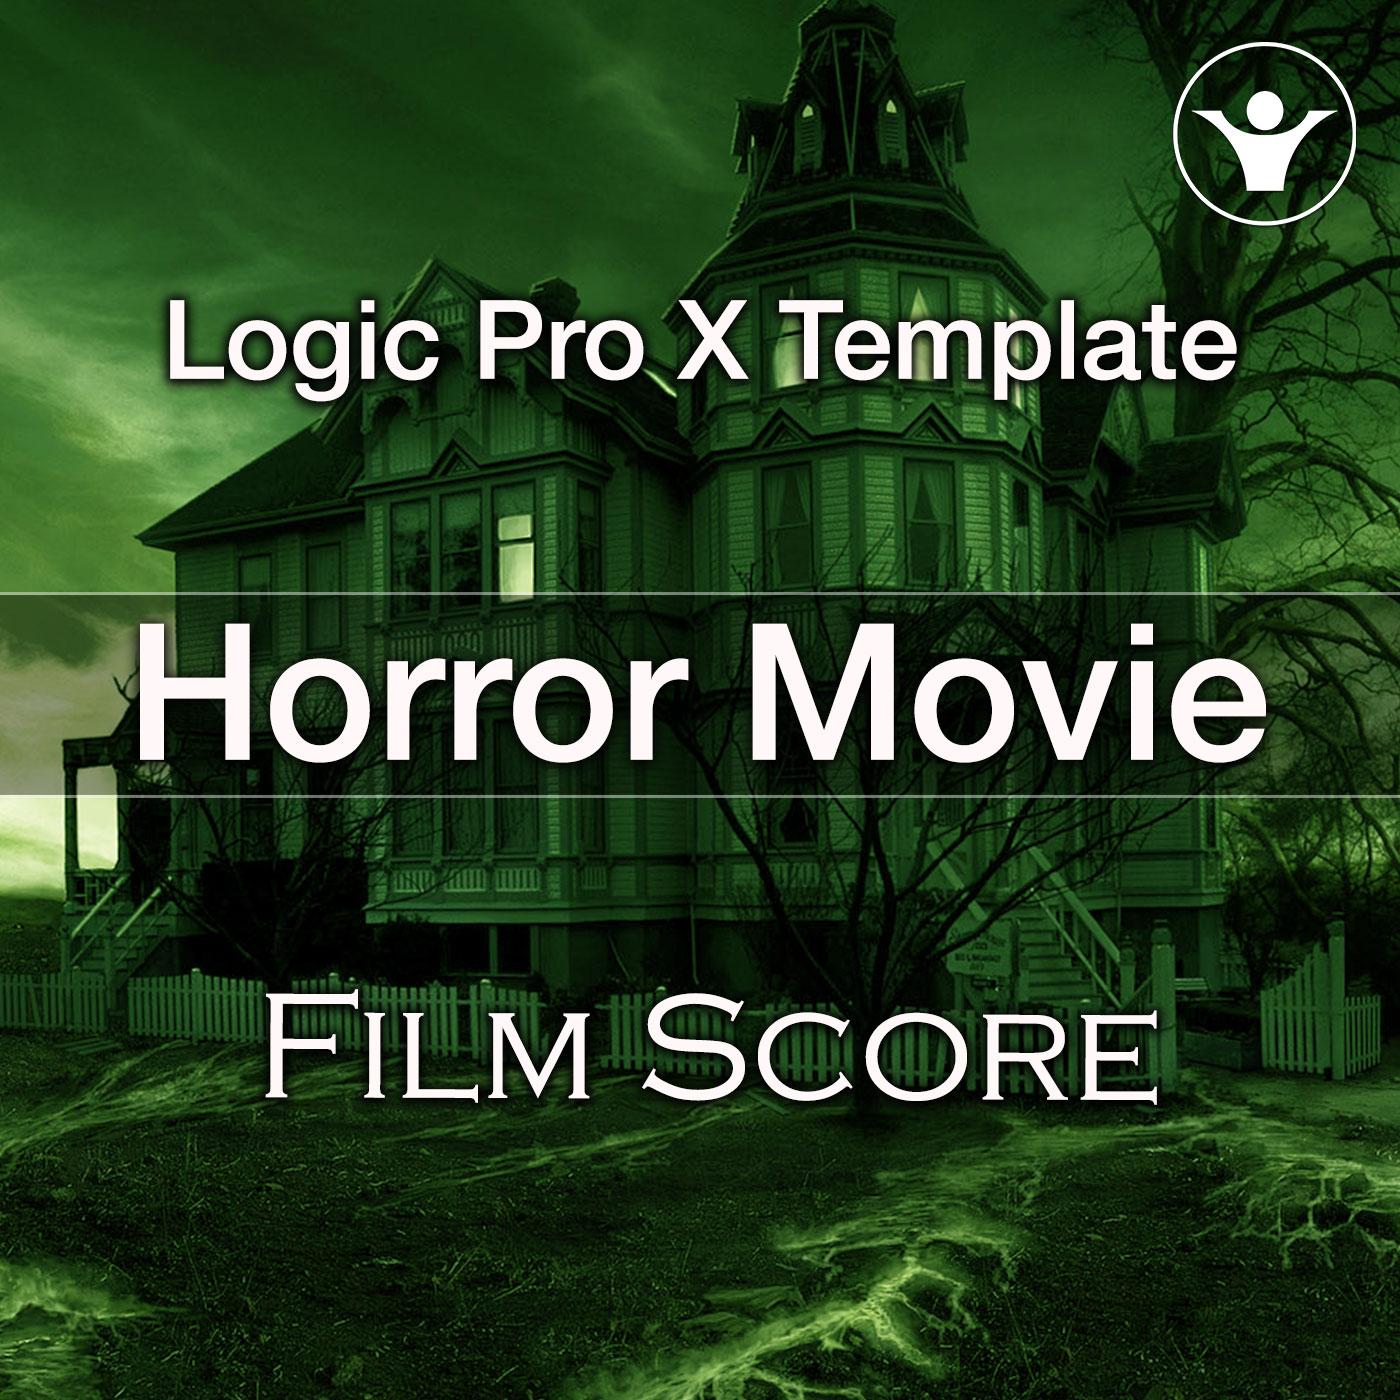 Horror Movie Film Score | Logic Pro X Template